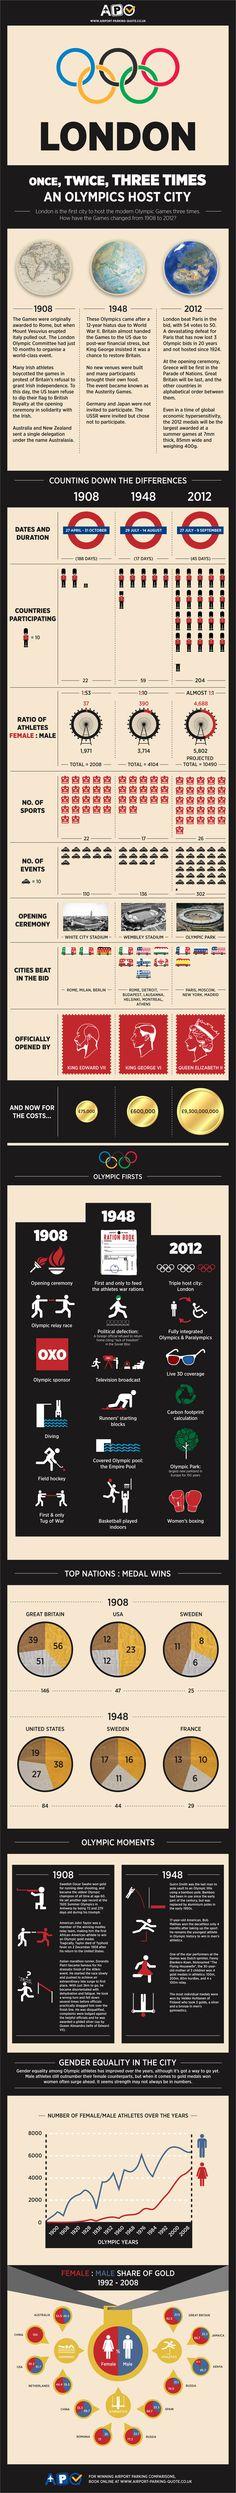 London – Three Times An Olympic City